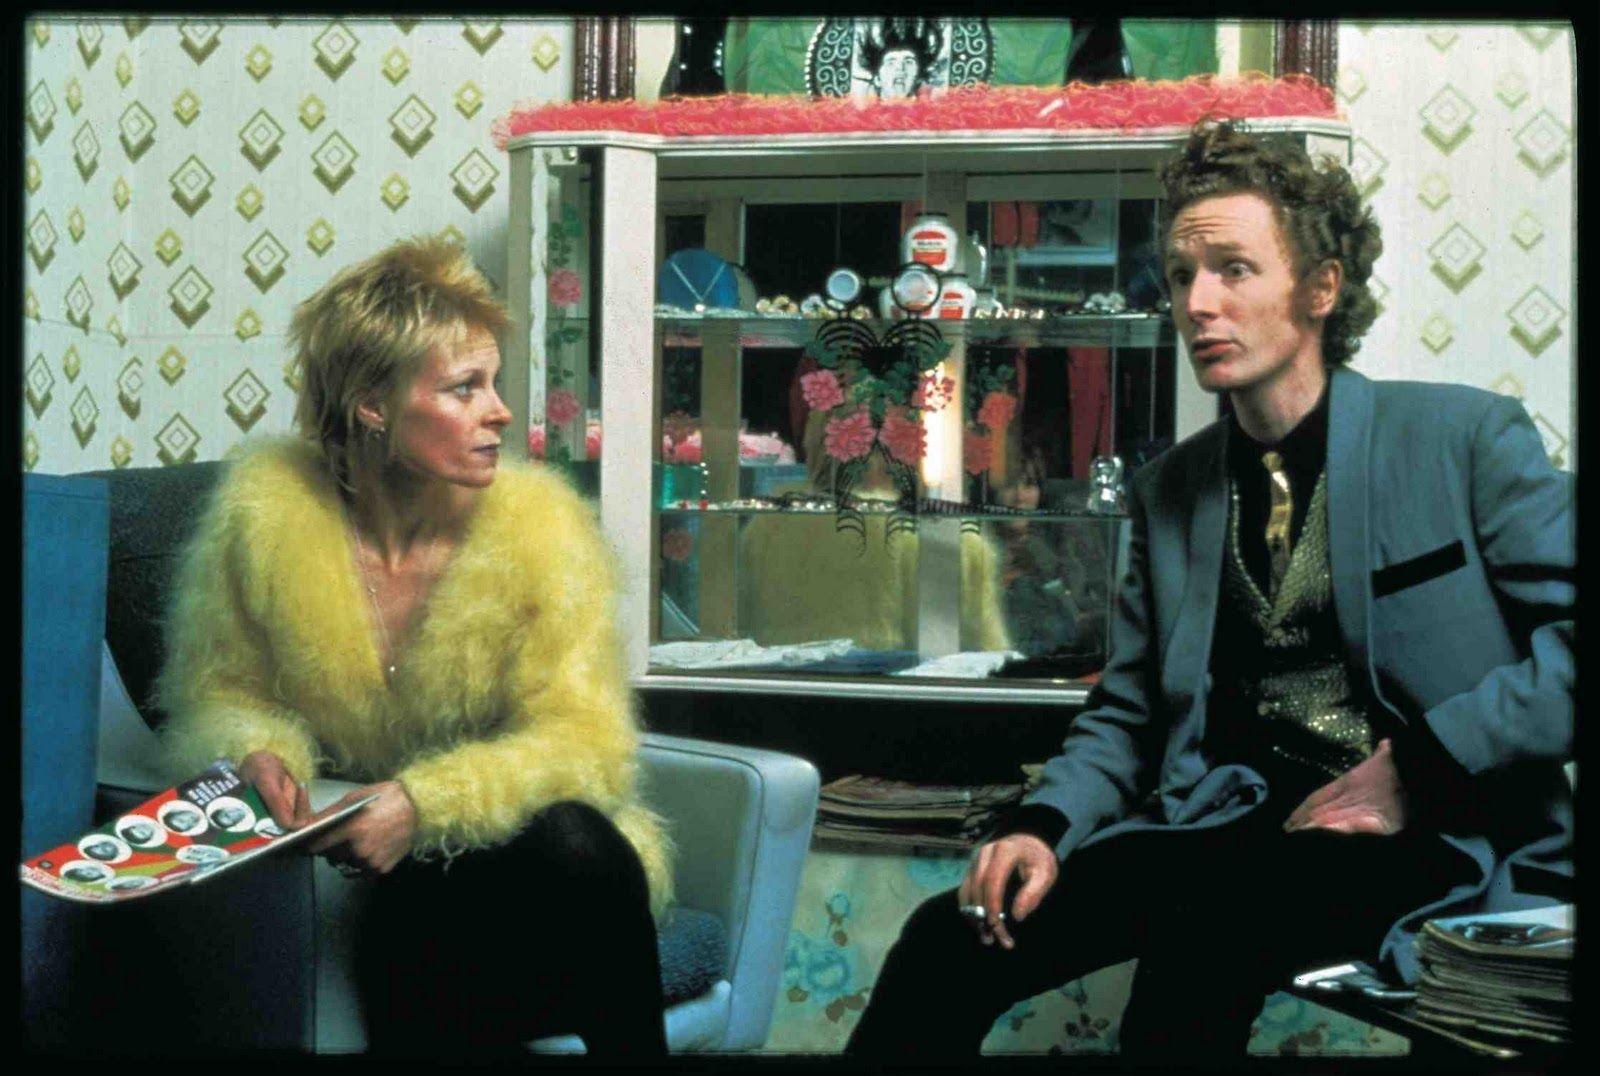 Malcolm McLaren and Vivienne Westwood, Let It Rock, 430 King's Road